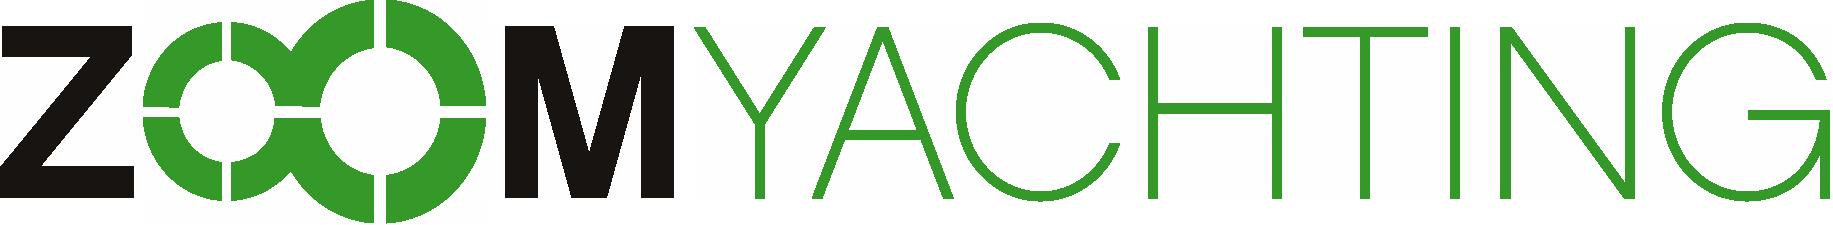 Zoom Yachting